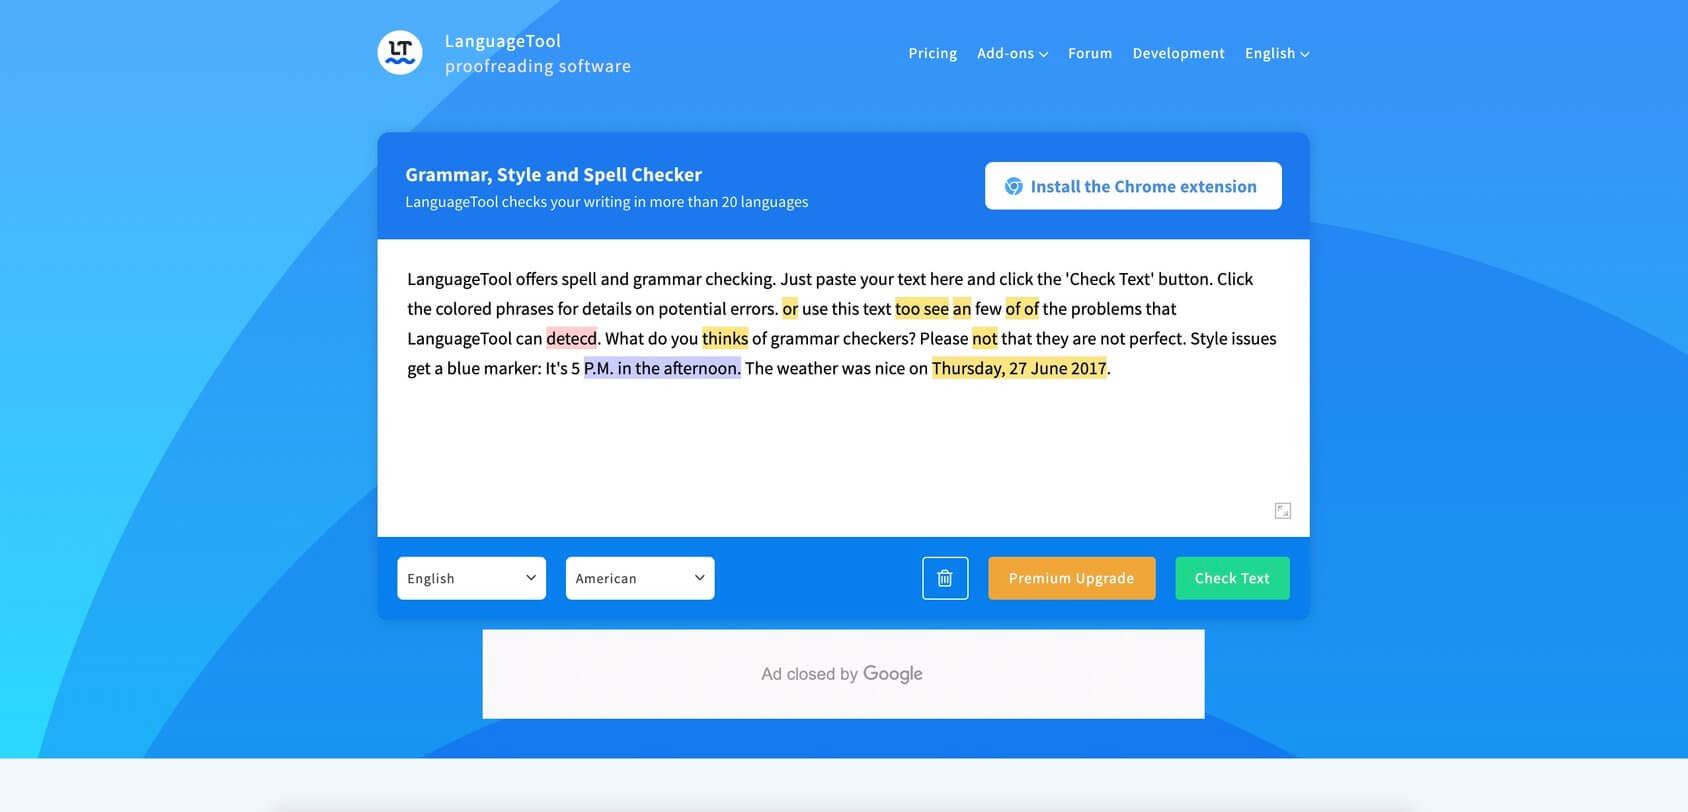 language tool homepage